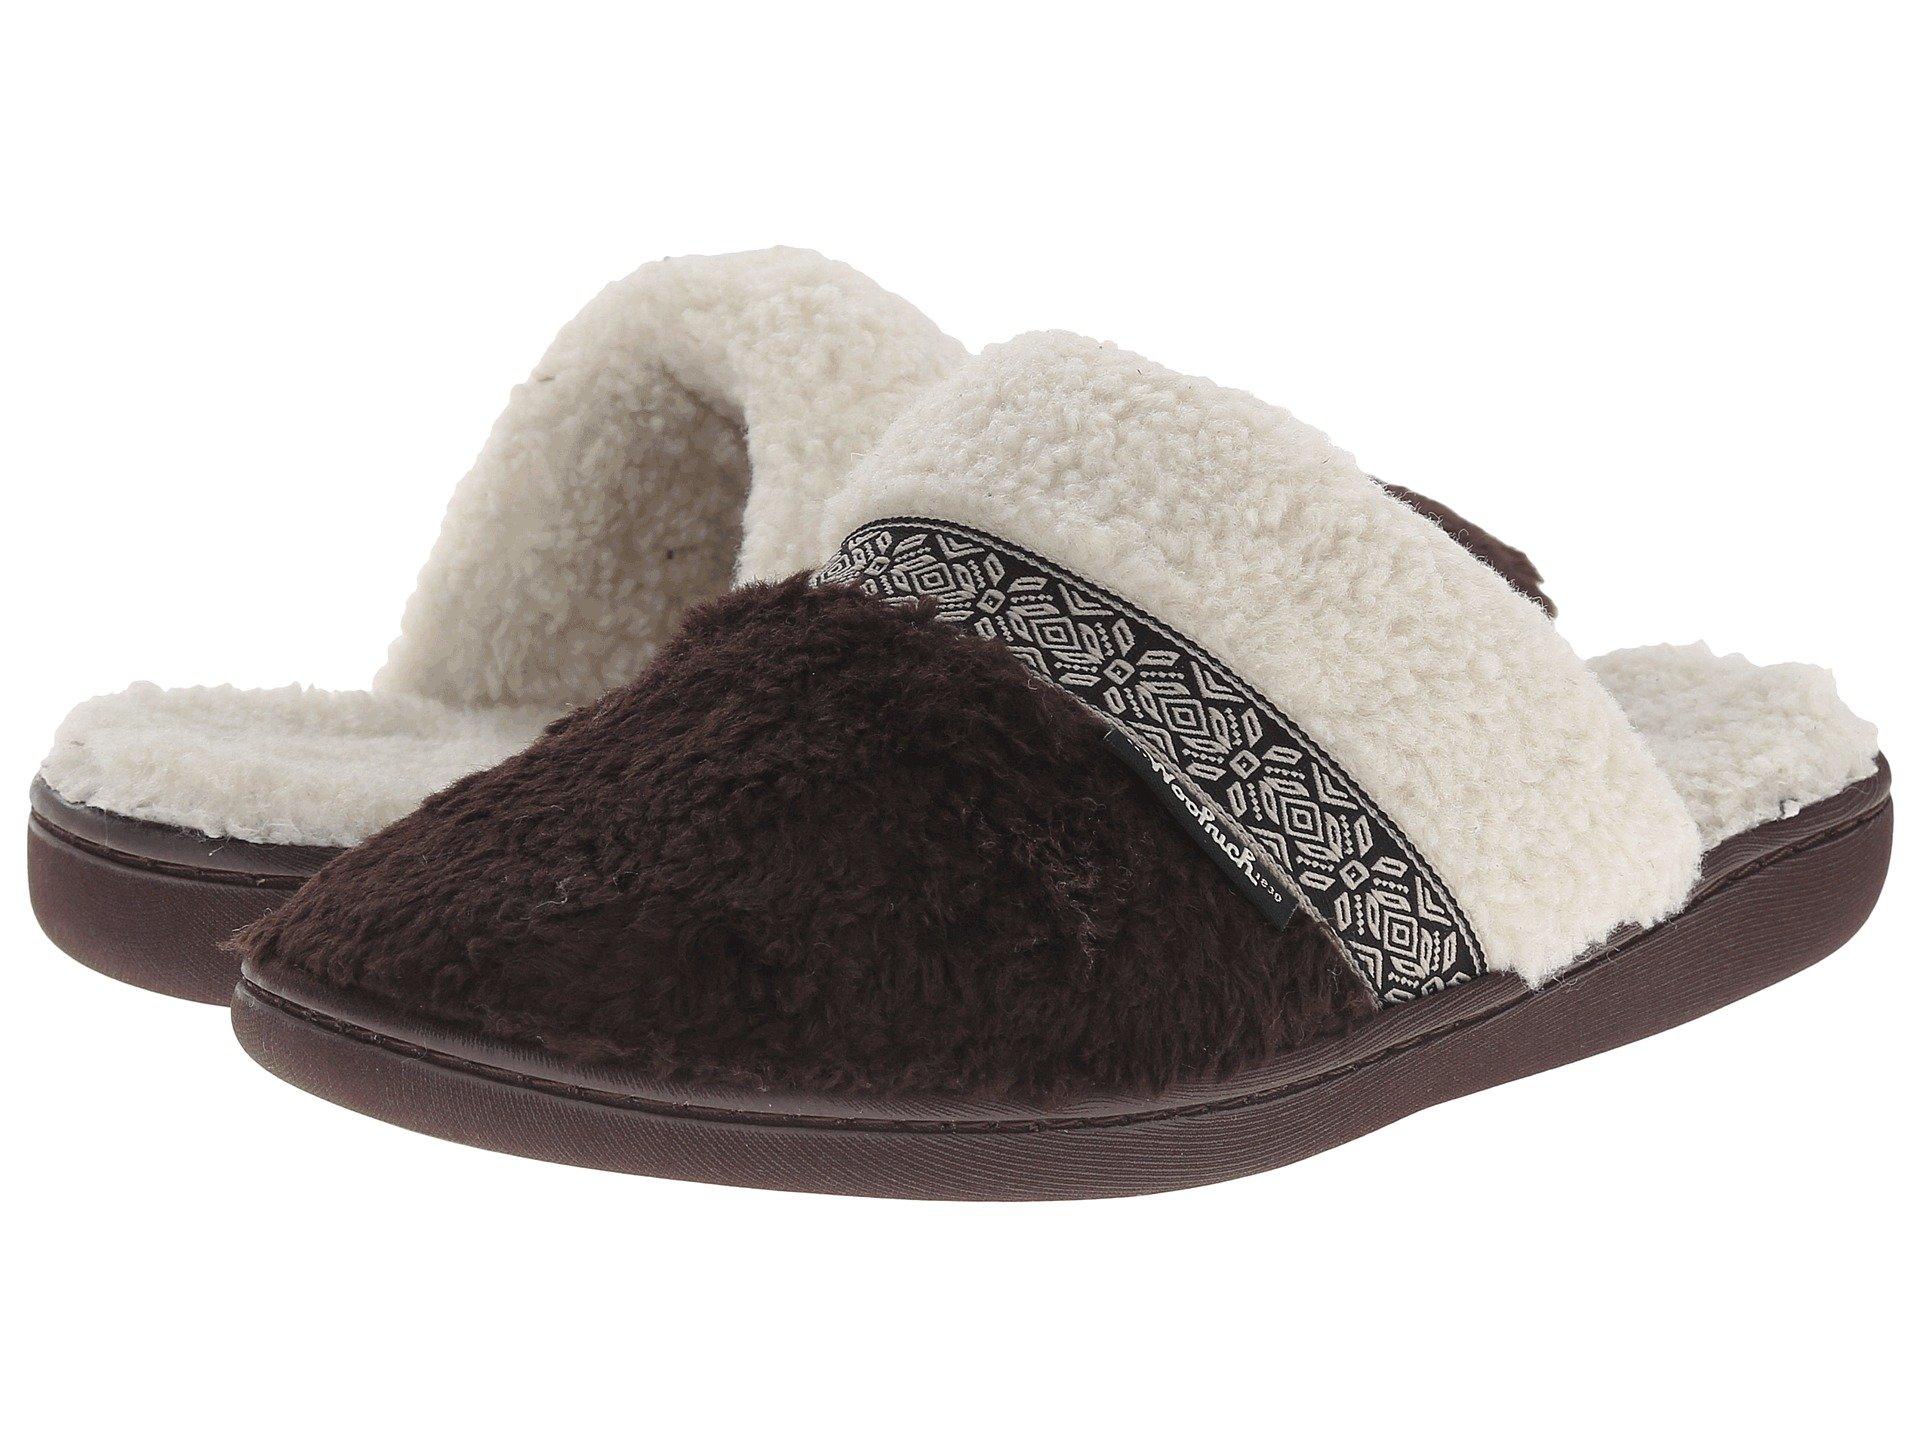 Zapato de Descanso para Mujer Woolrich Whitecap Slide  + Woolrich en VeoyCompro.net